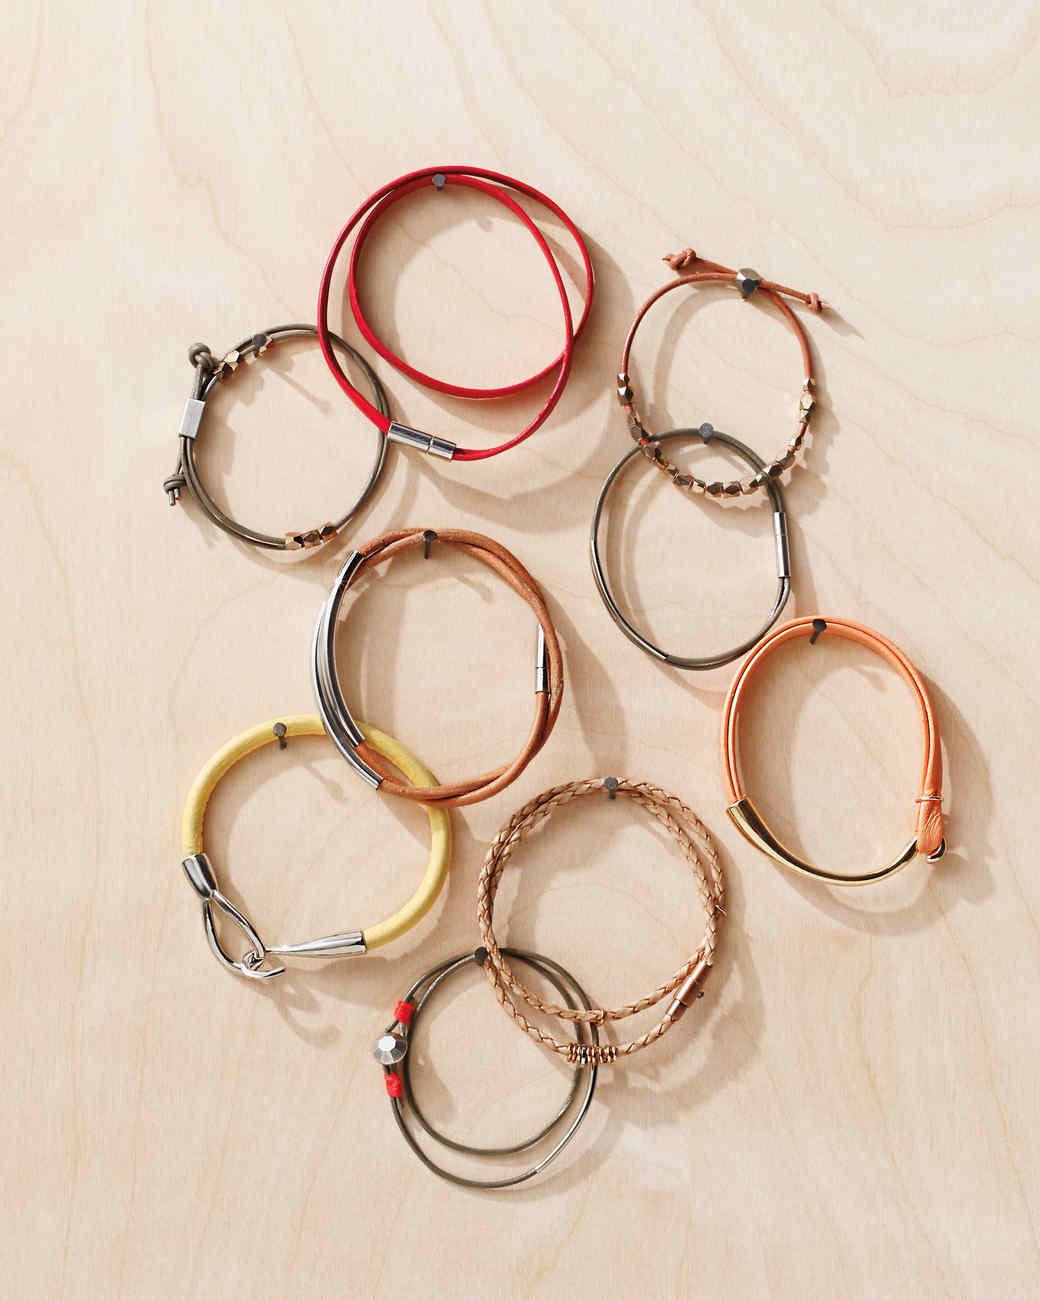 leather-bracelets-diy-mld110876.jpg